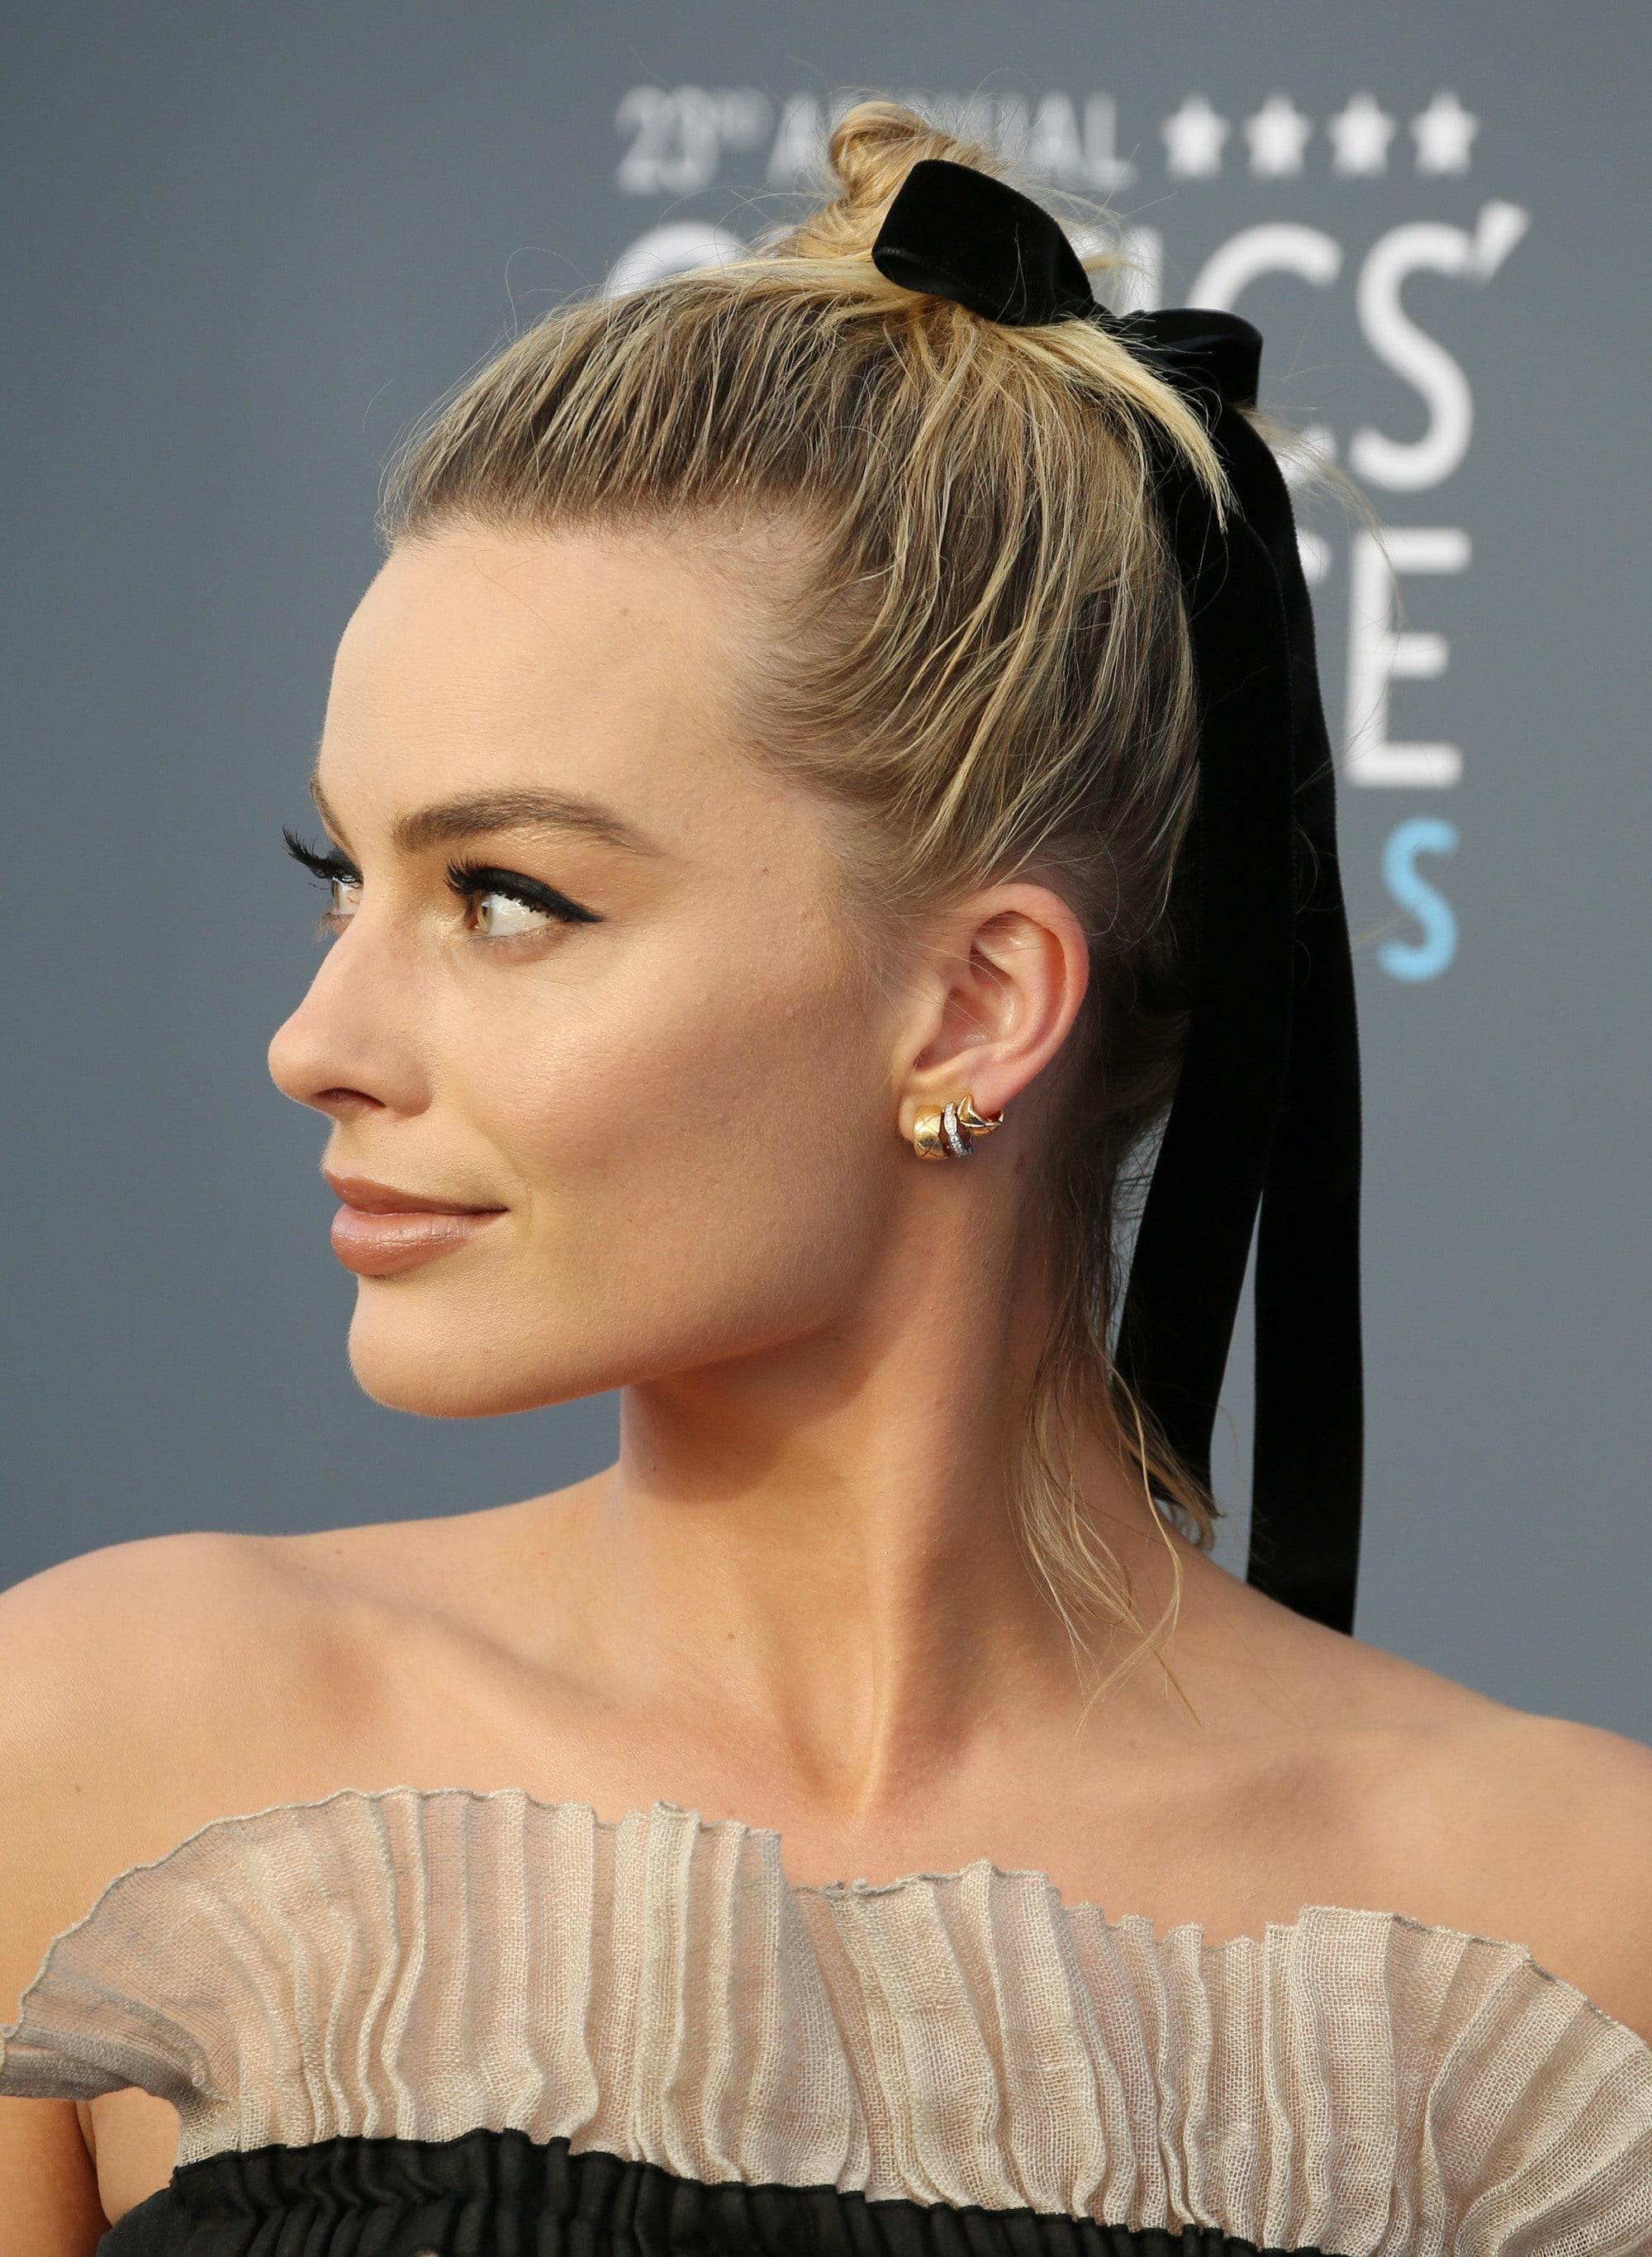 Ballerina Bun Margot Robbie at the Critics Choice Awards hair in bun with ribbon